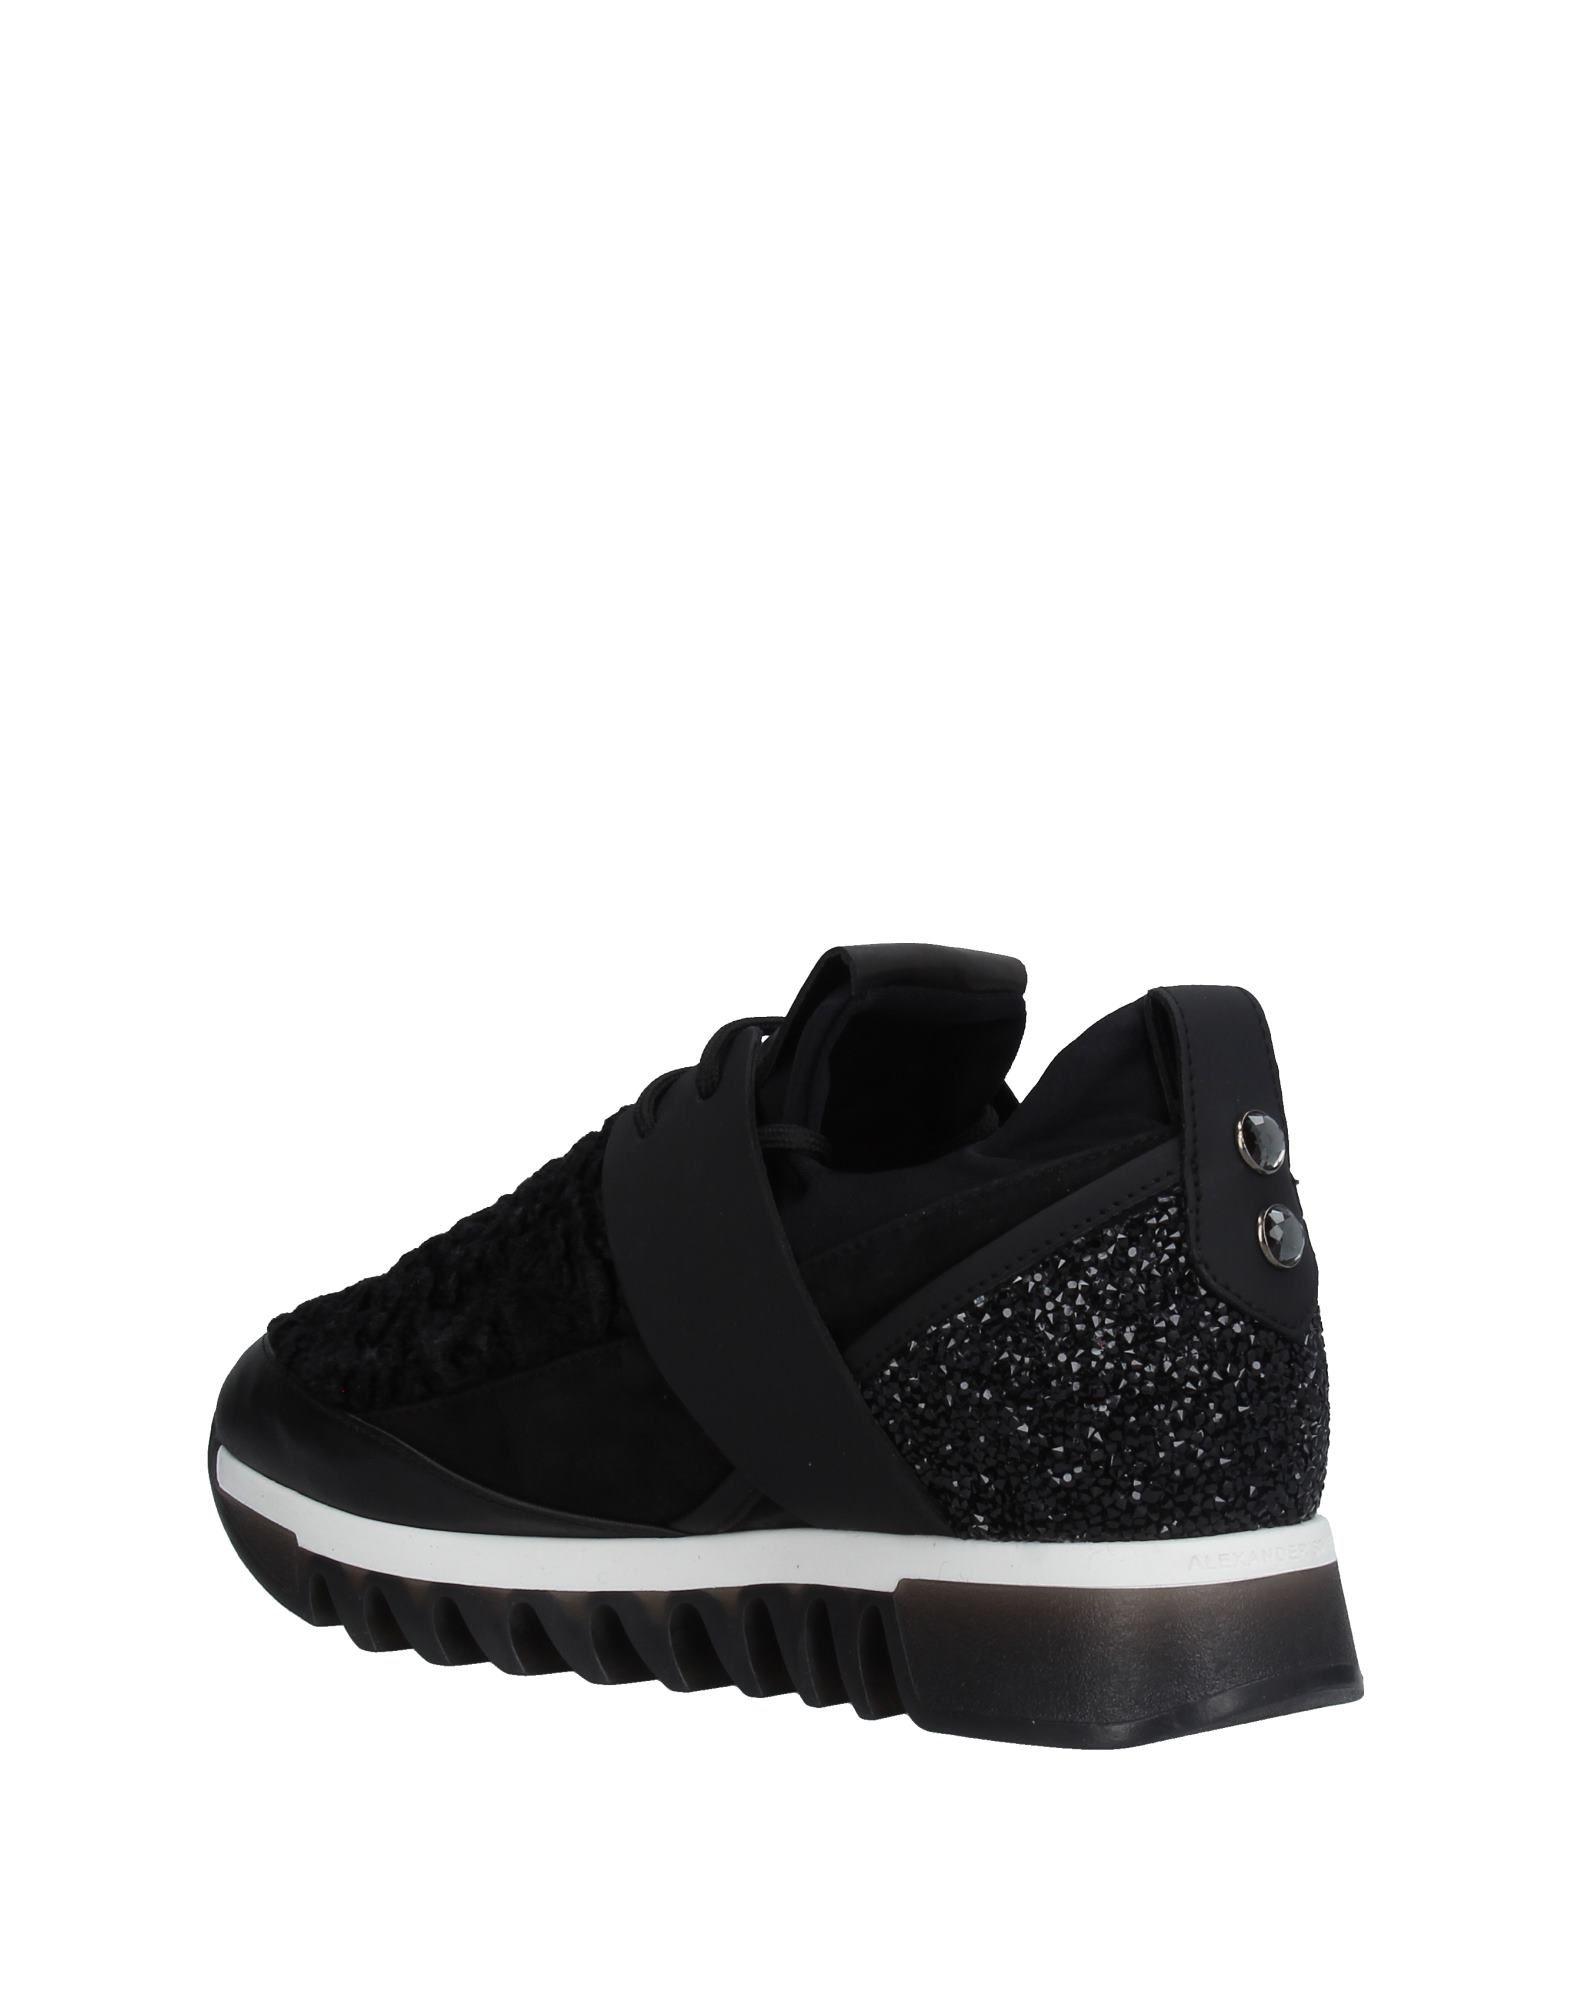 Alexander Smith Sneakers Damen Damen Sneakers  11233341UL Gute Qualität beliebte Schuhe 3cb353